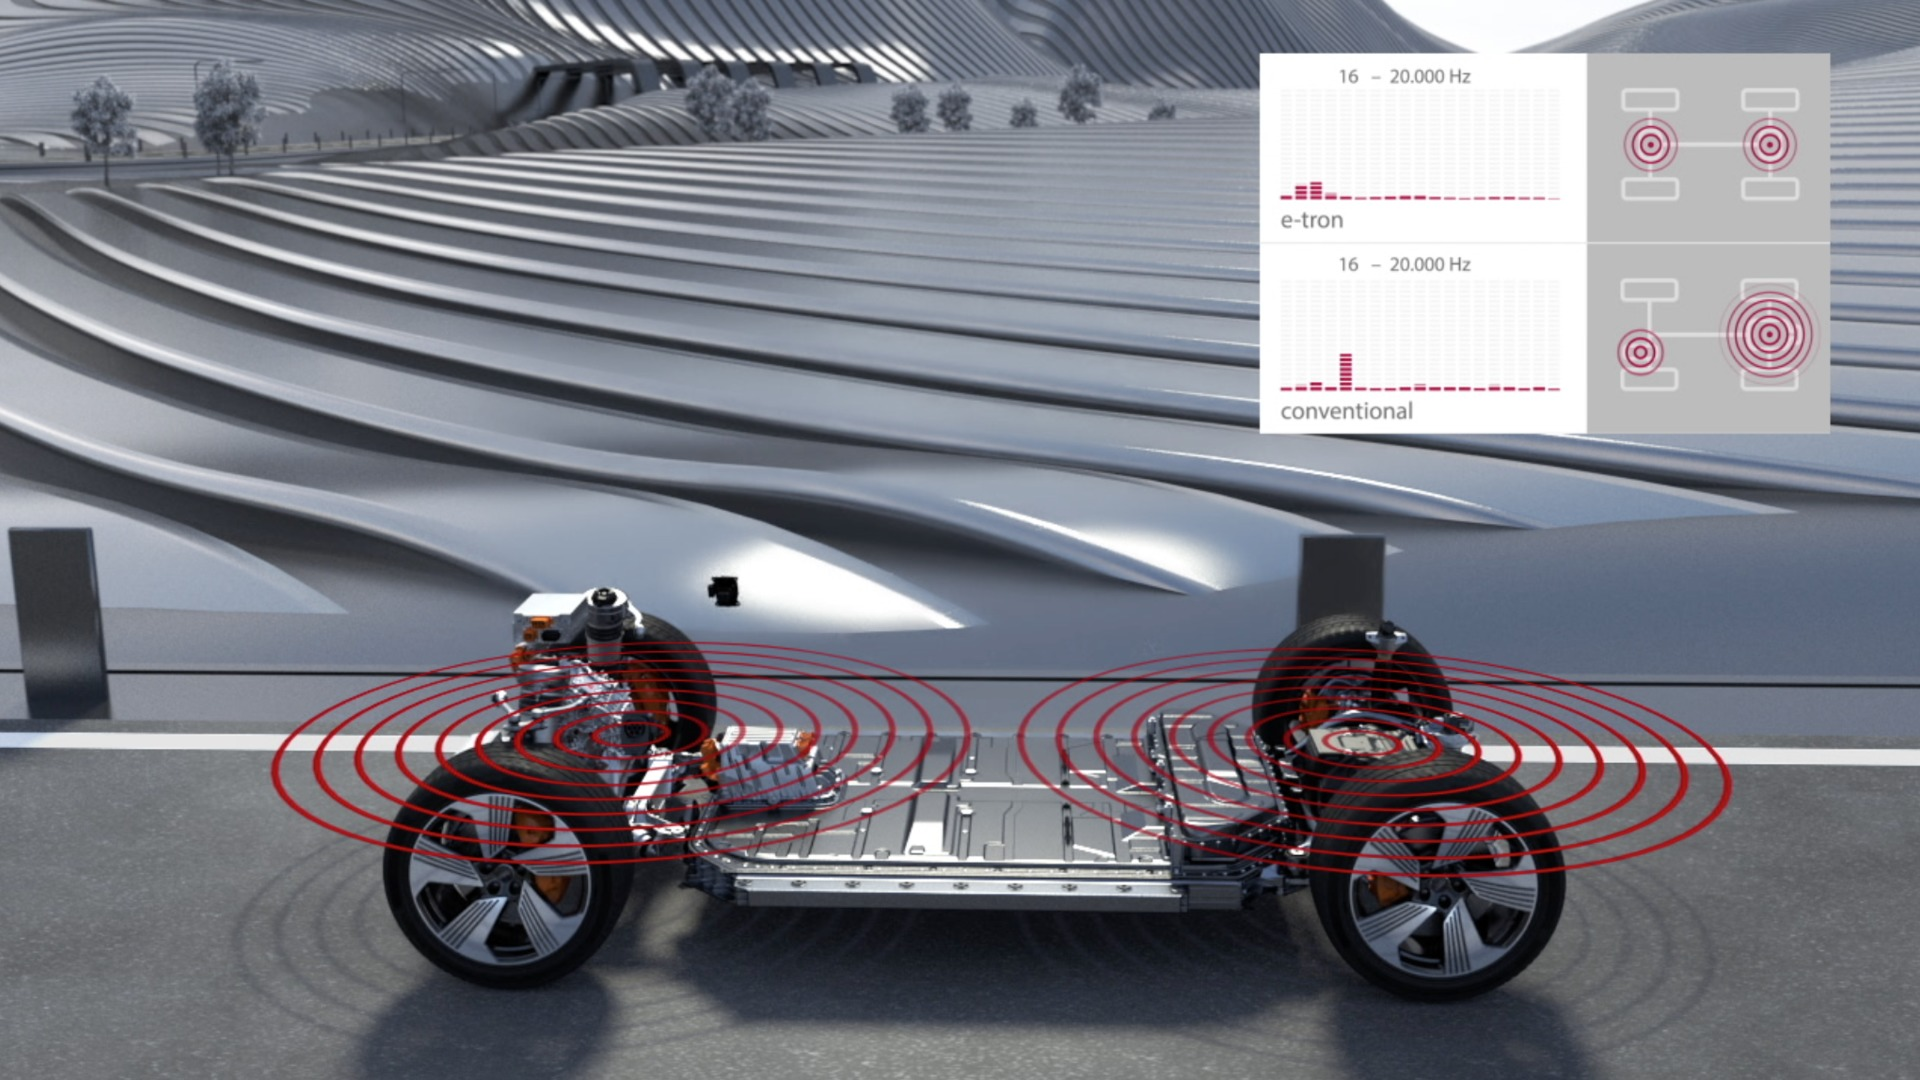 Acoustics of the Audi e-tron (animation)